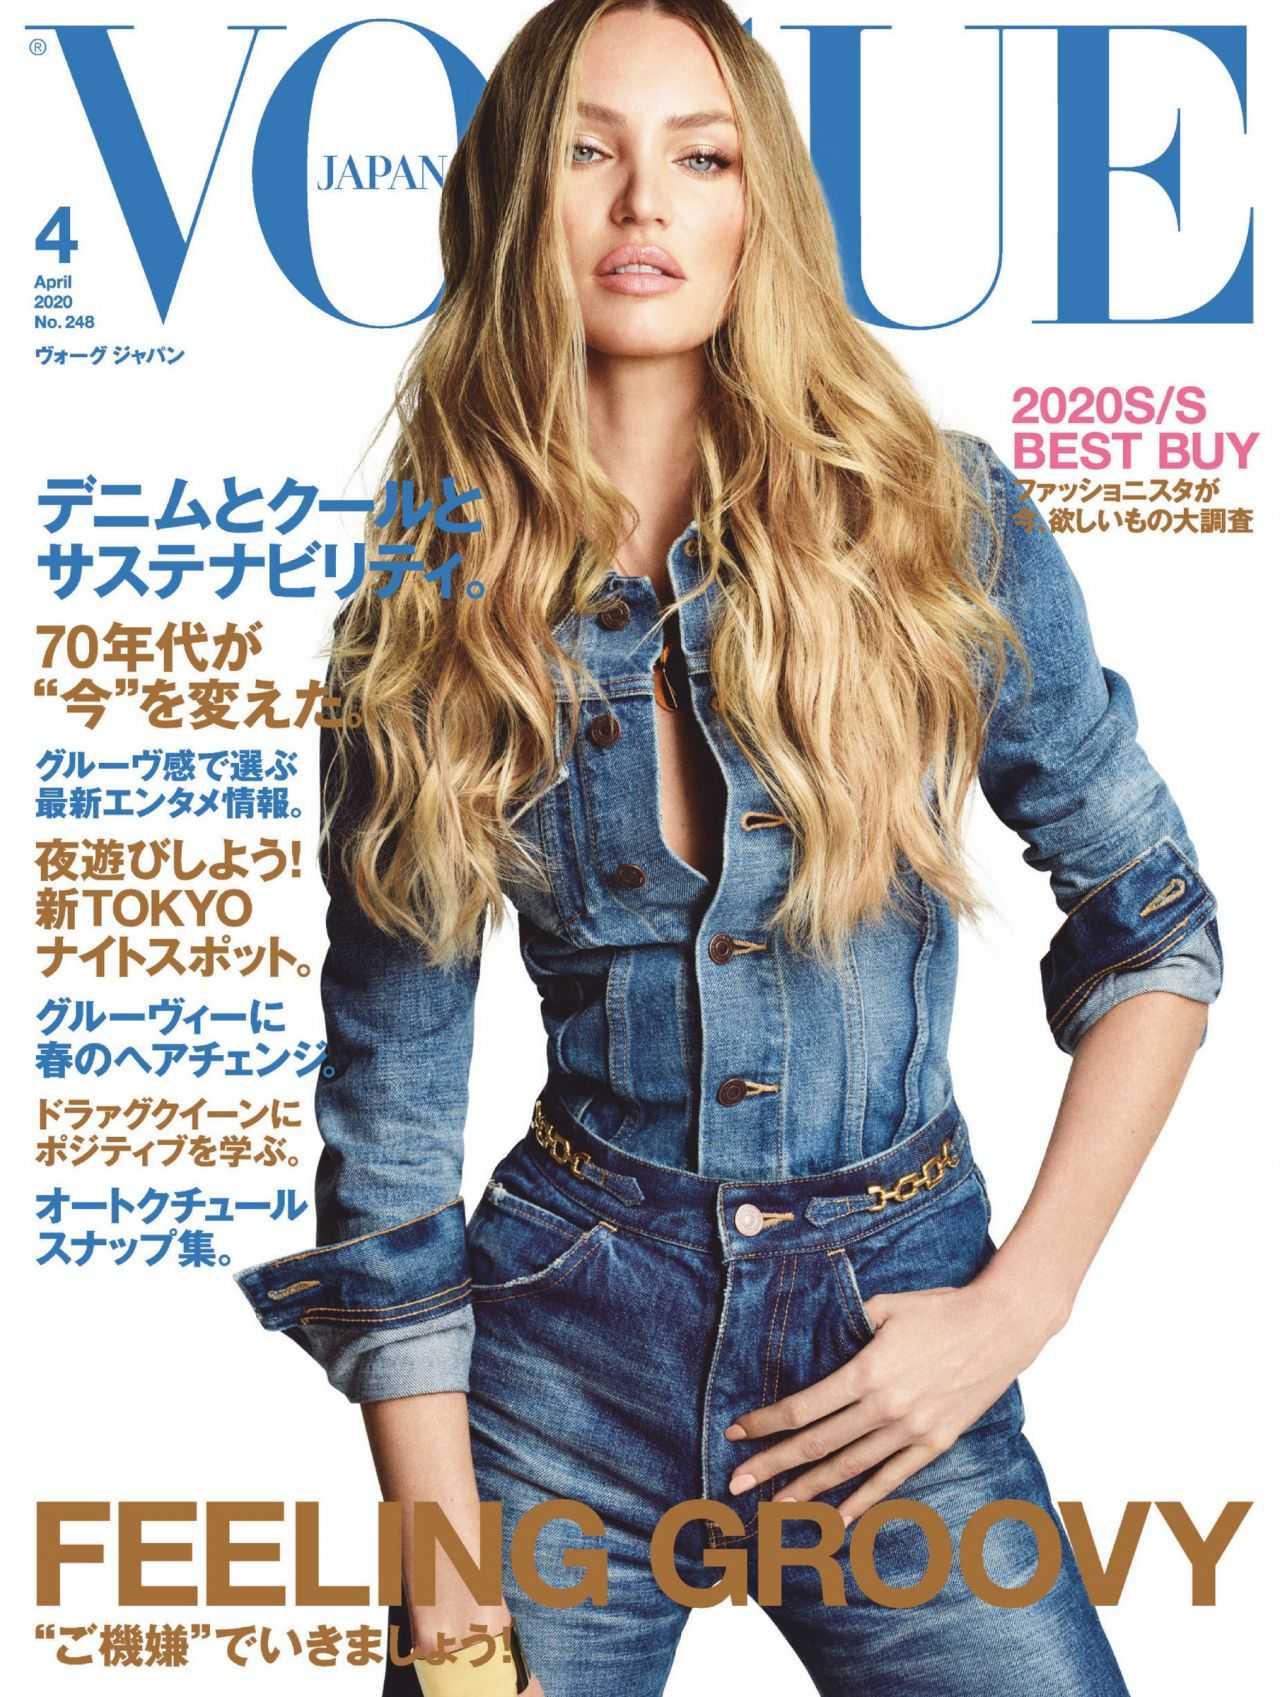 Candice Swanepoel - Vogue Japan Cover (April 2020)